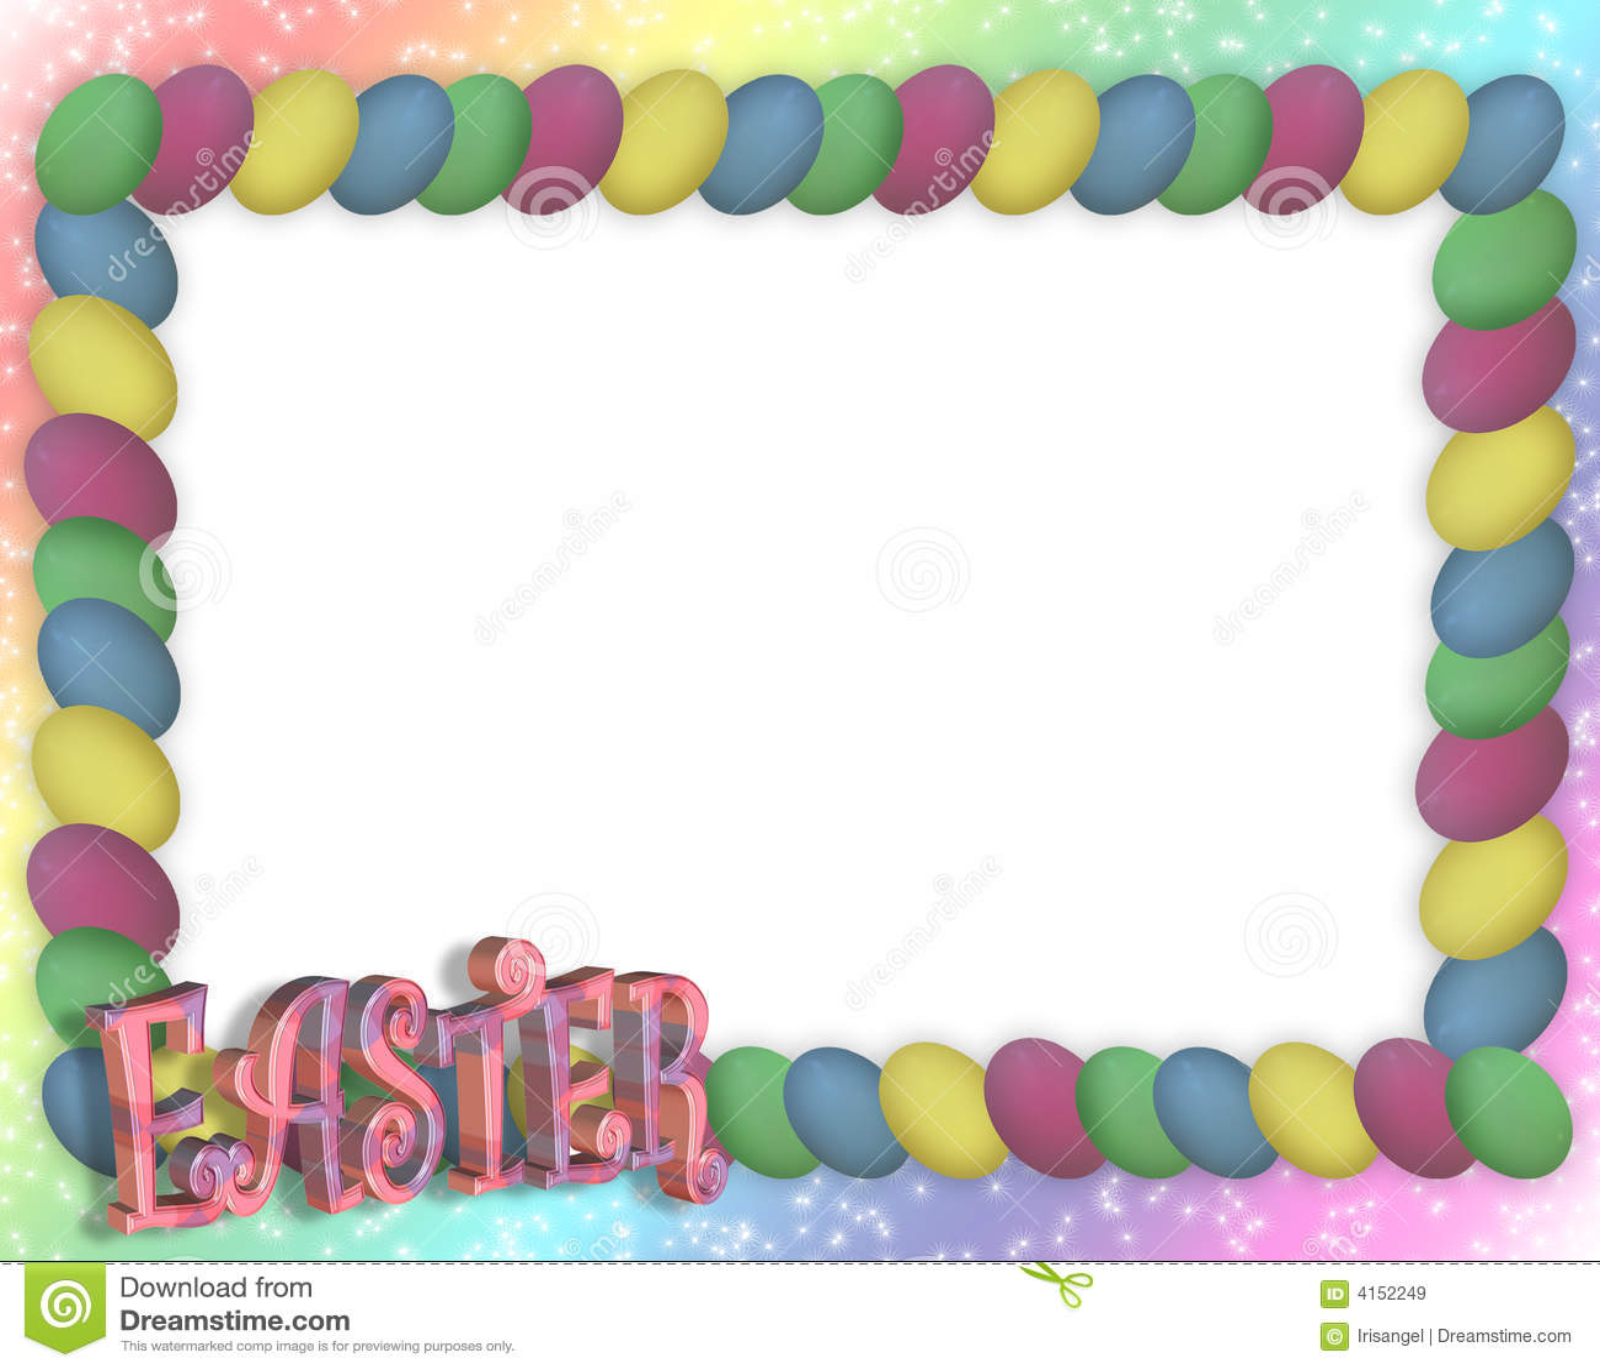 Easter Bunny Border Clip Art